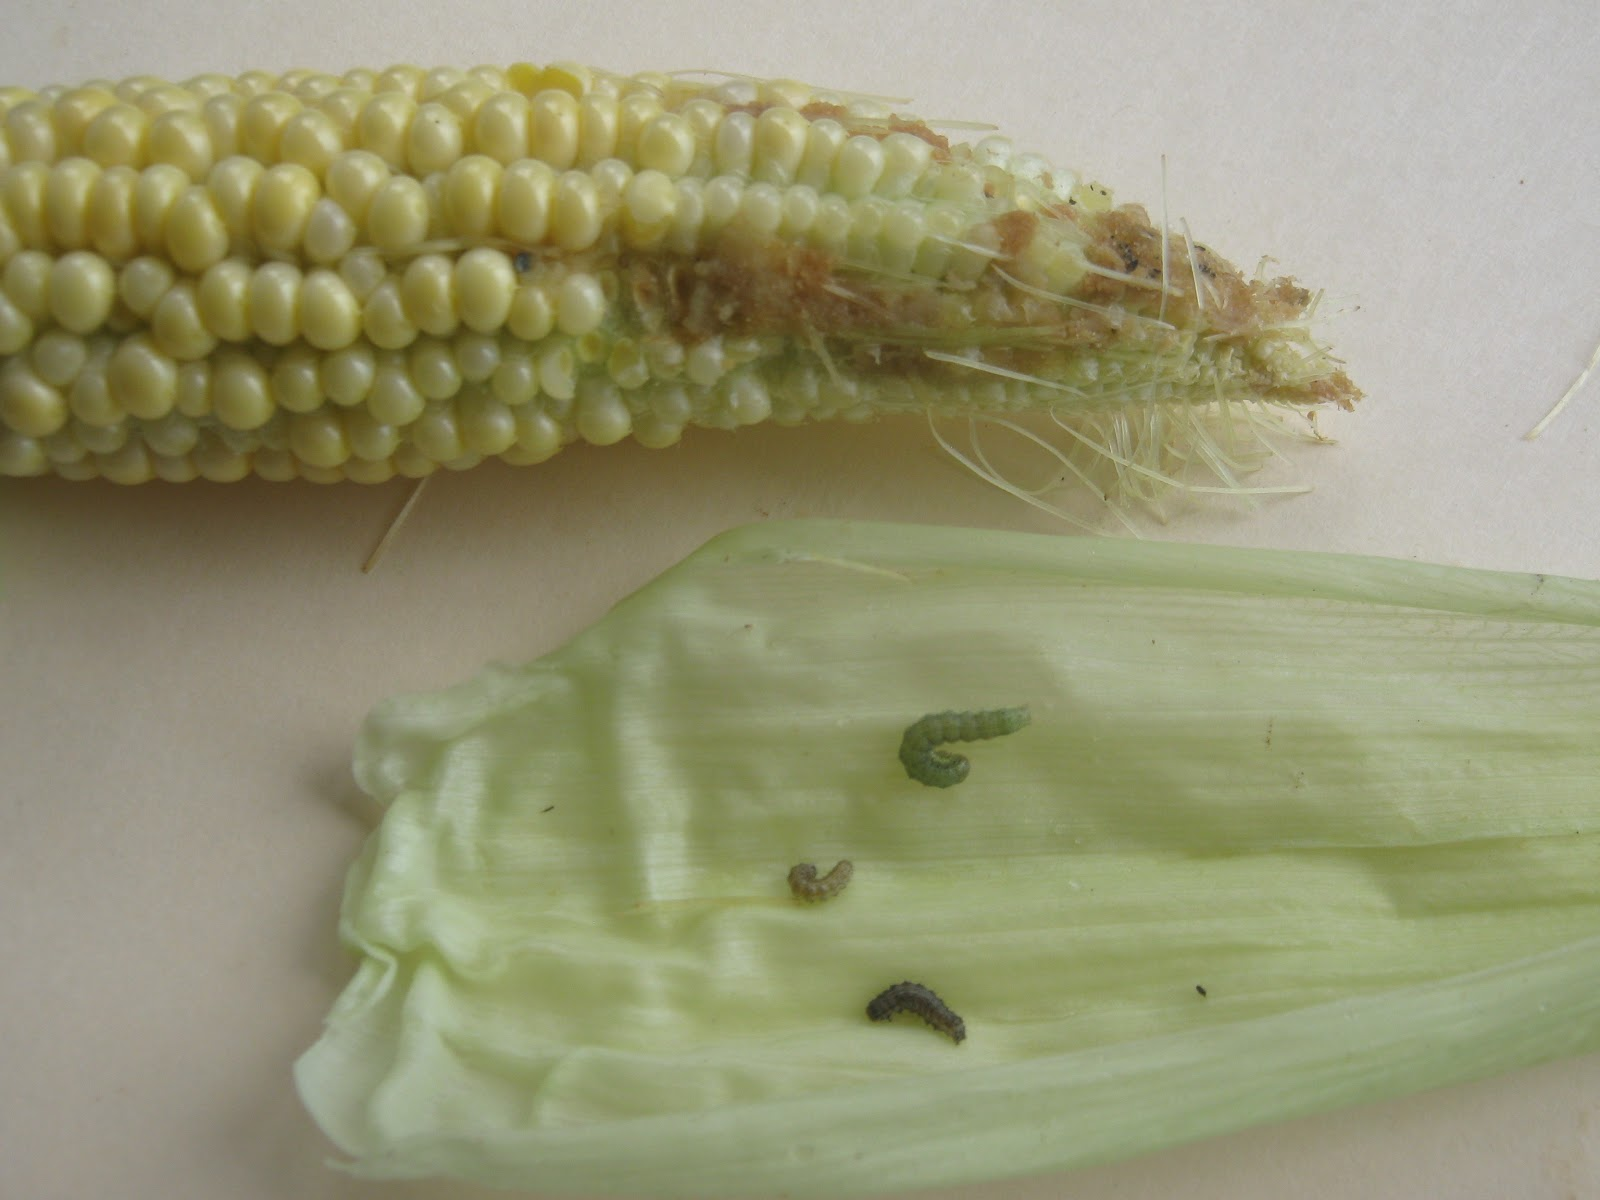 Garden Guy Hawaii: The Corn Earworm